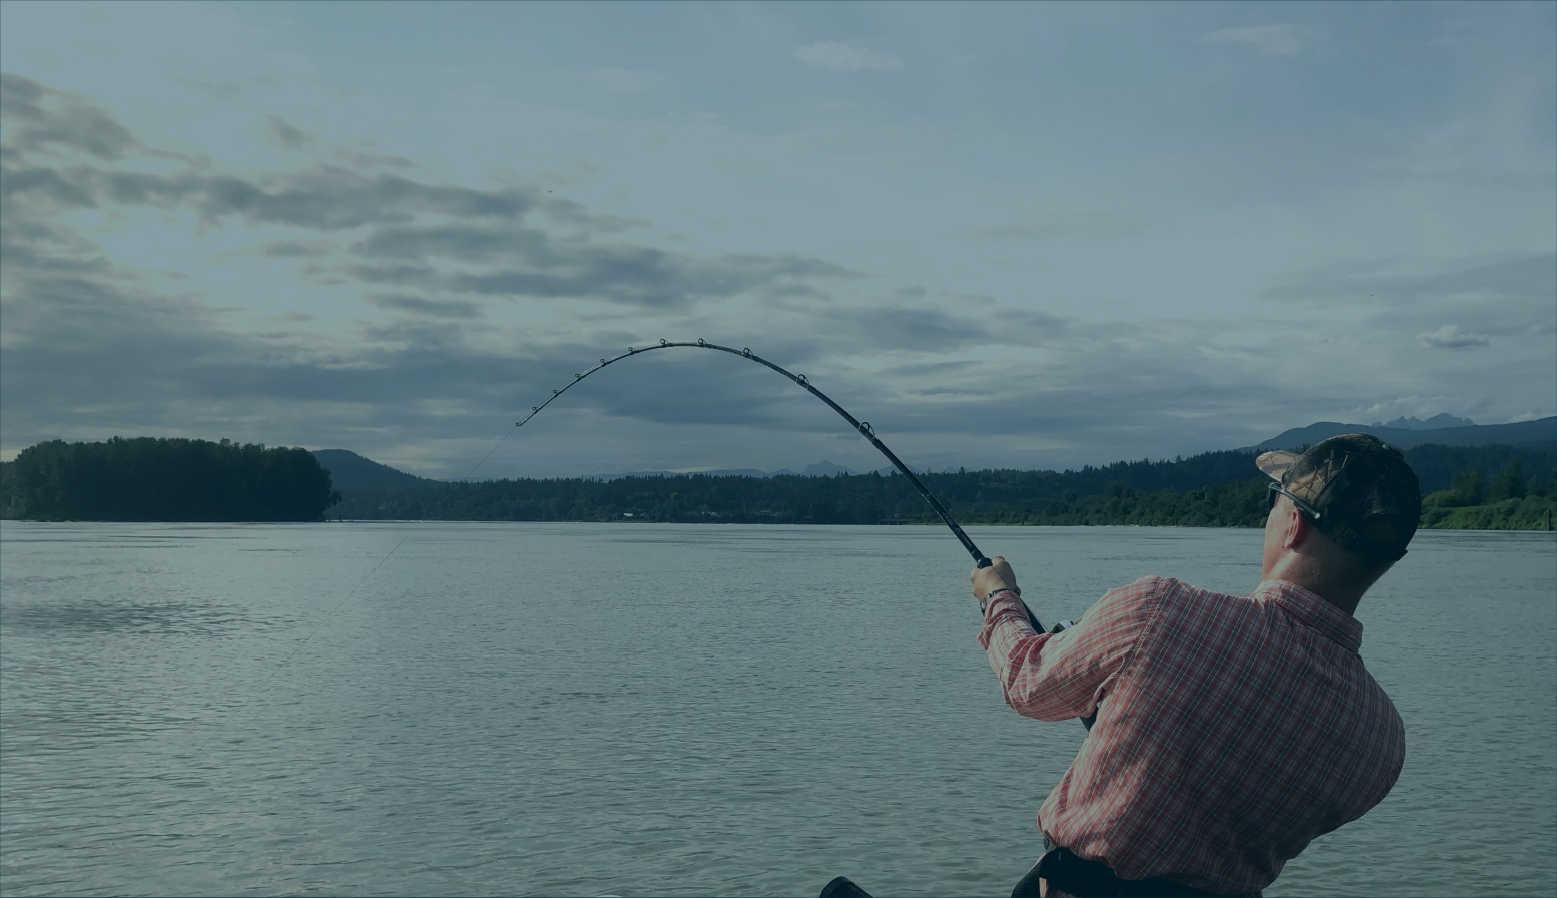 bc fishing, vancouver fishing, fraser river fishing, sturgeon fishing,